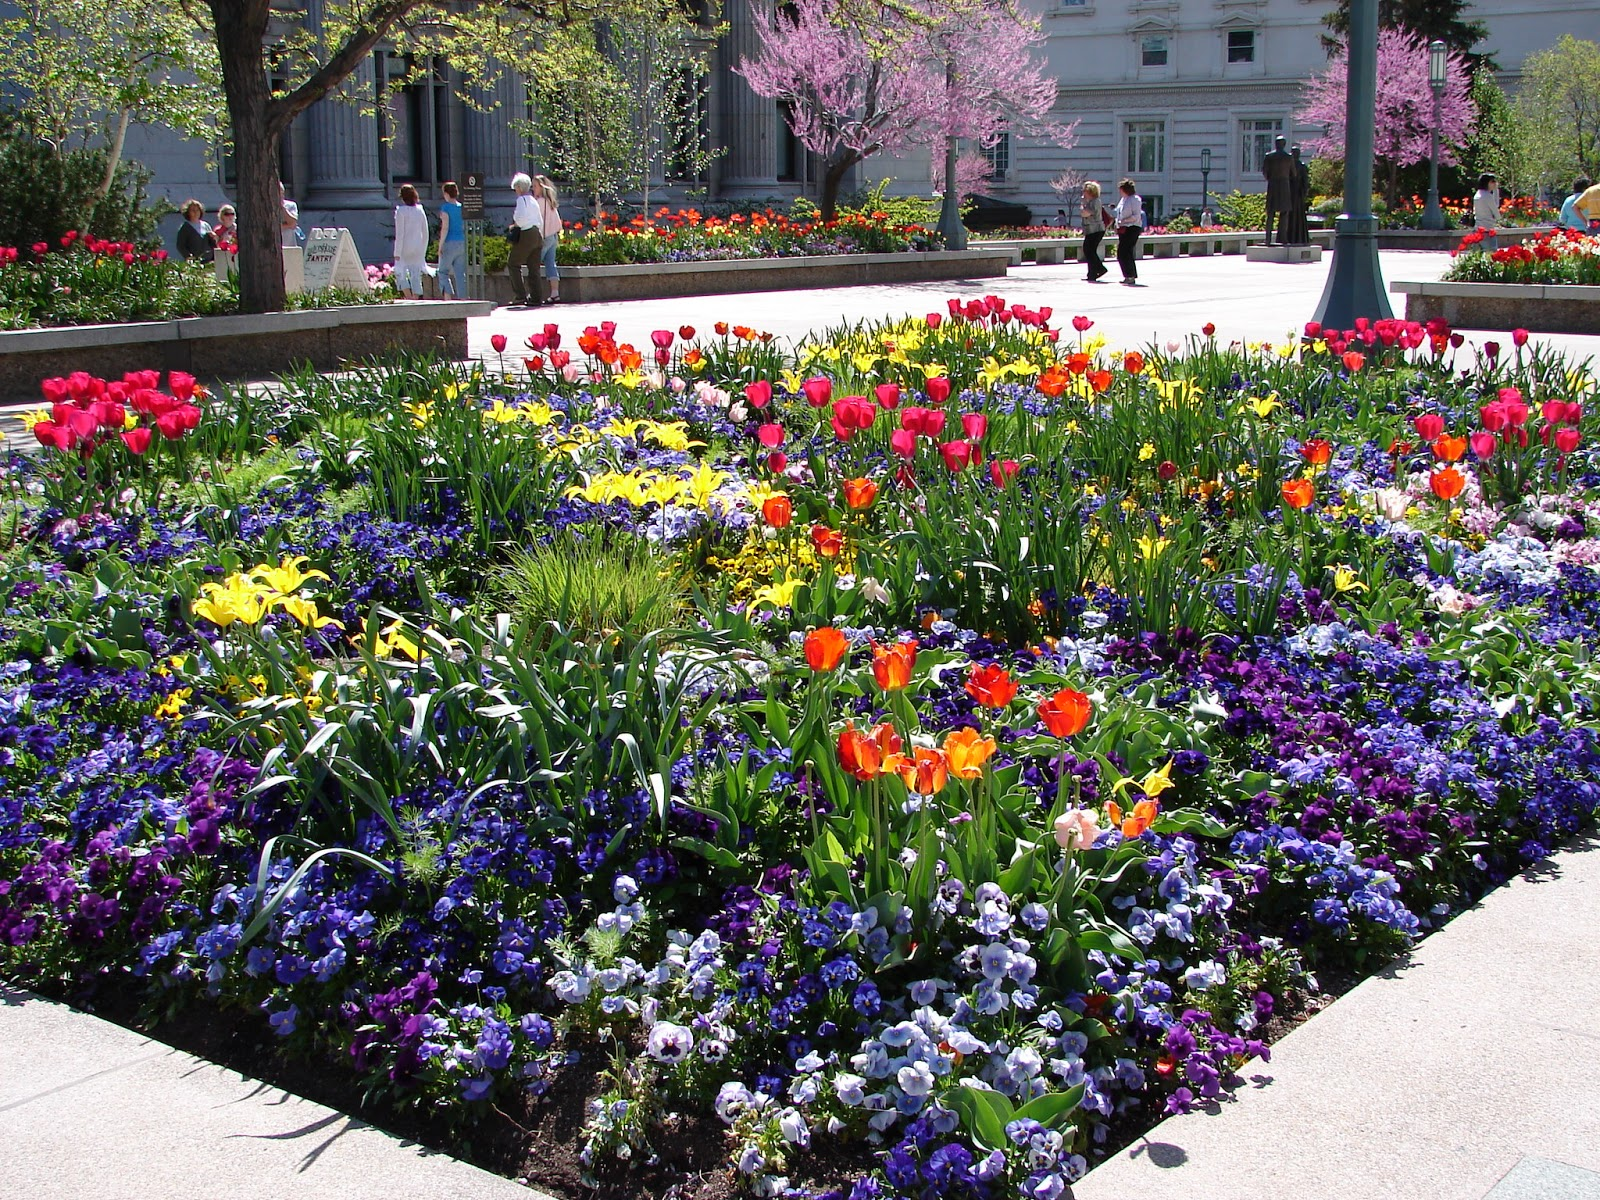 temple square gardens flowers, summer activities in Utah